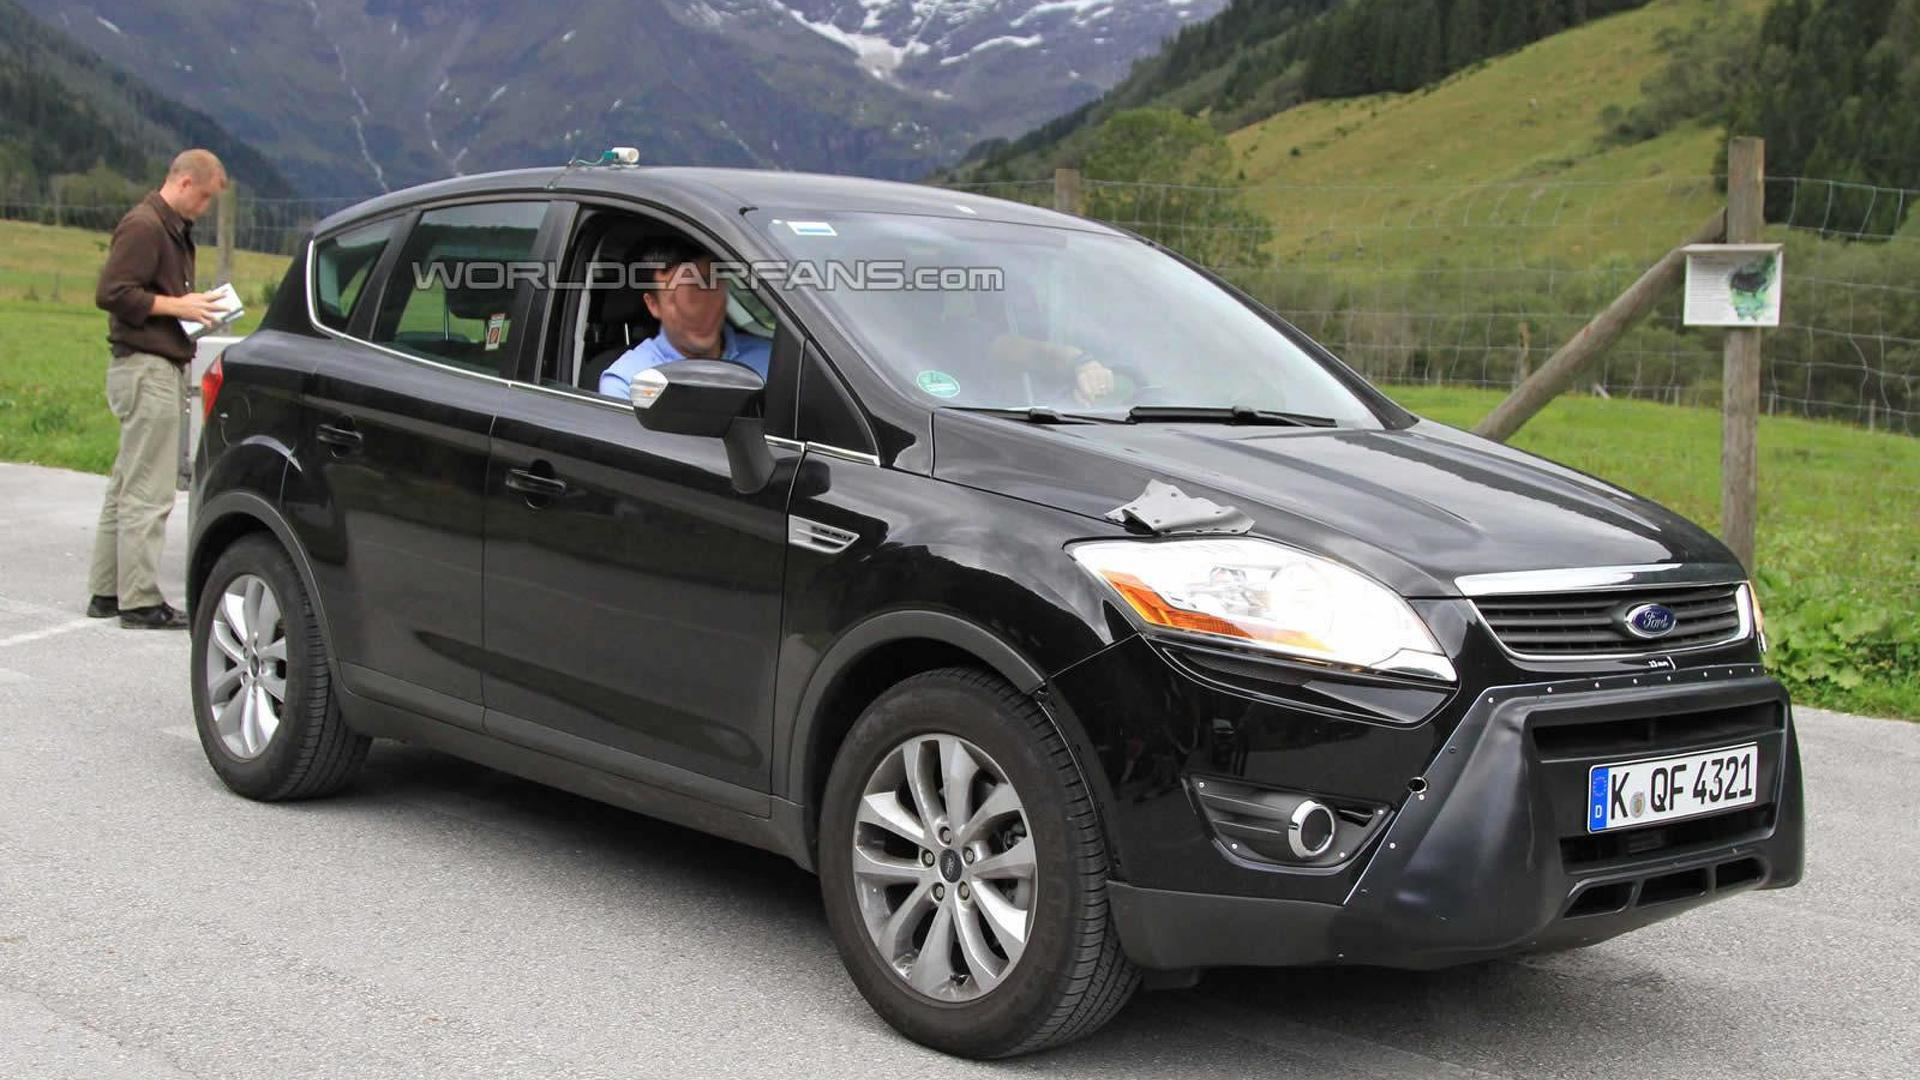 Ford Kuga: цены, отзывы, форум, тест-драйв, фото, видео